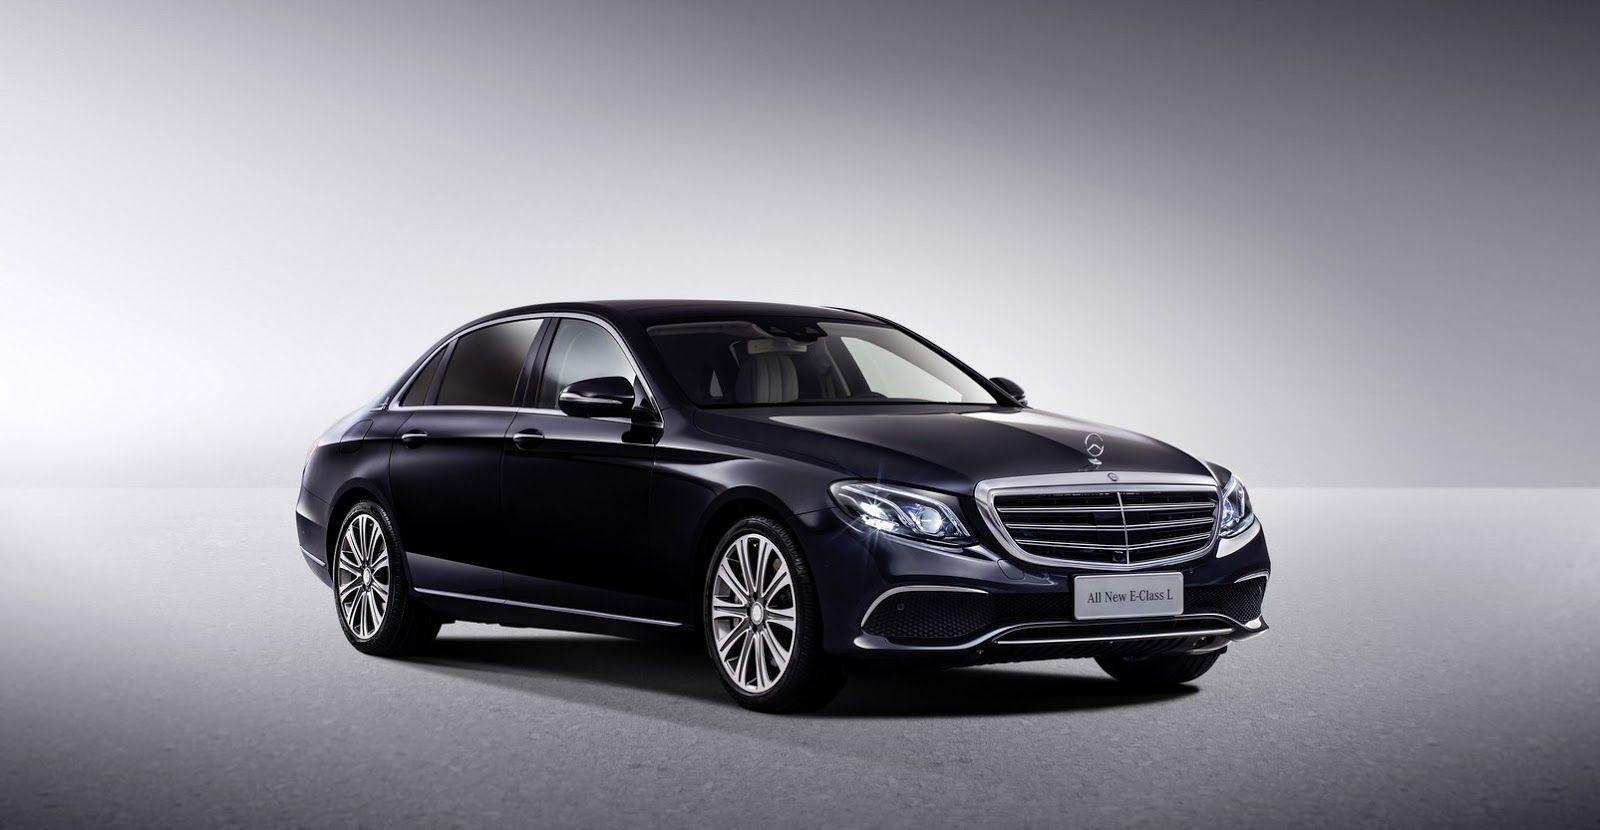 China S New Mercedes Benz E Class Lwb Looks Like A Mini Maybach Carscoops Benz E Class Benz E Mercedes Benz